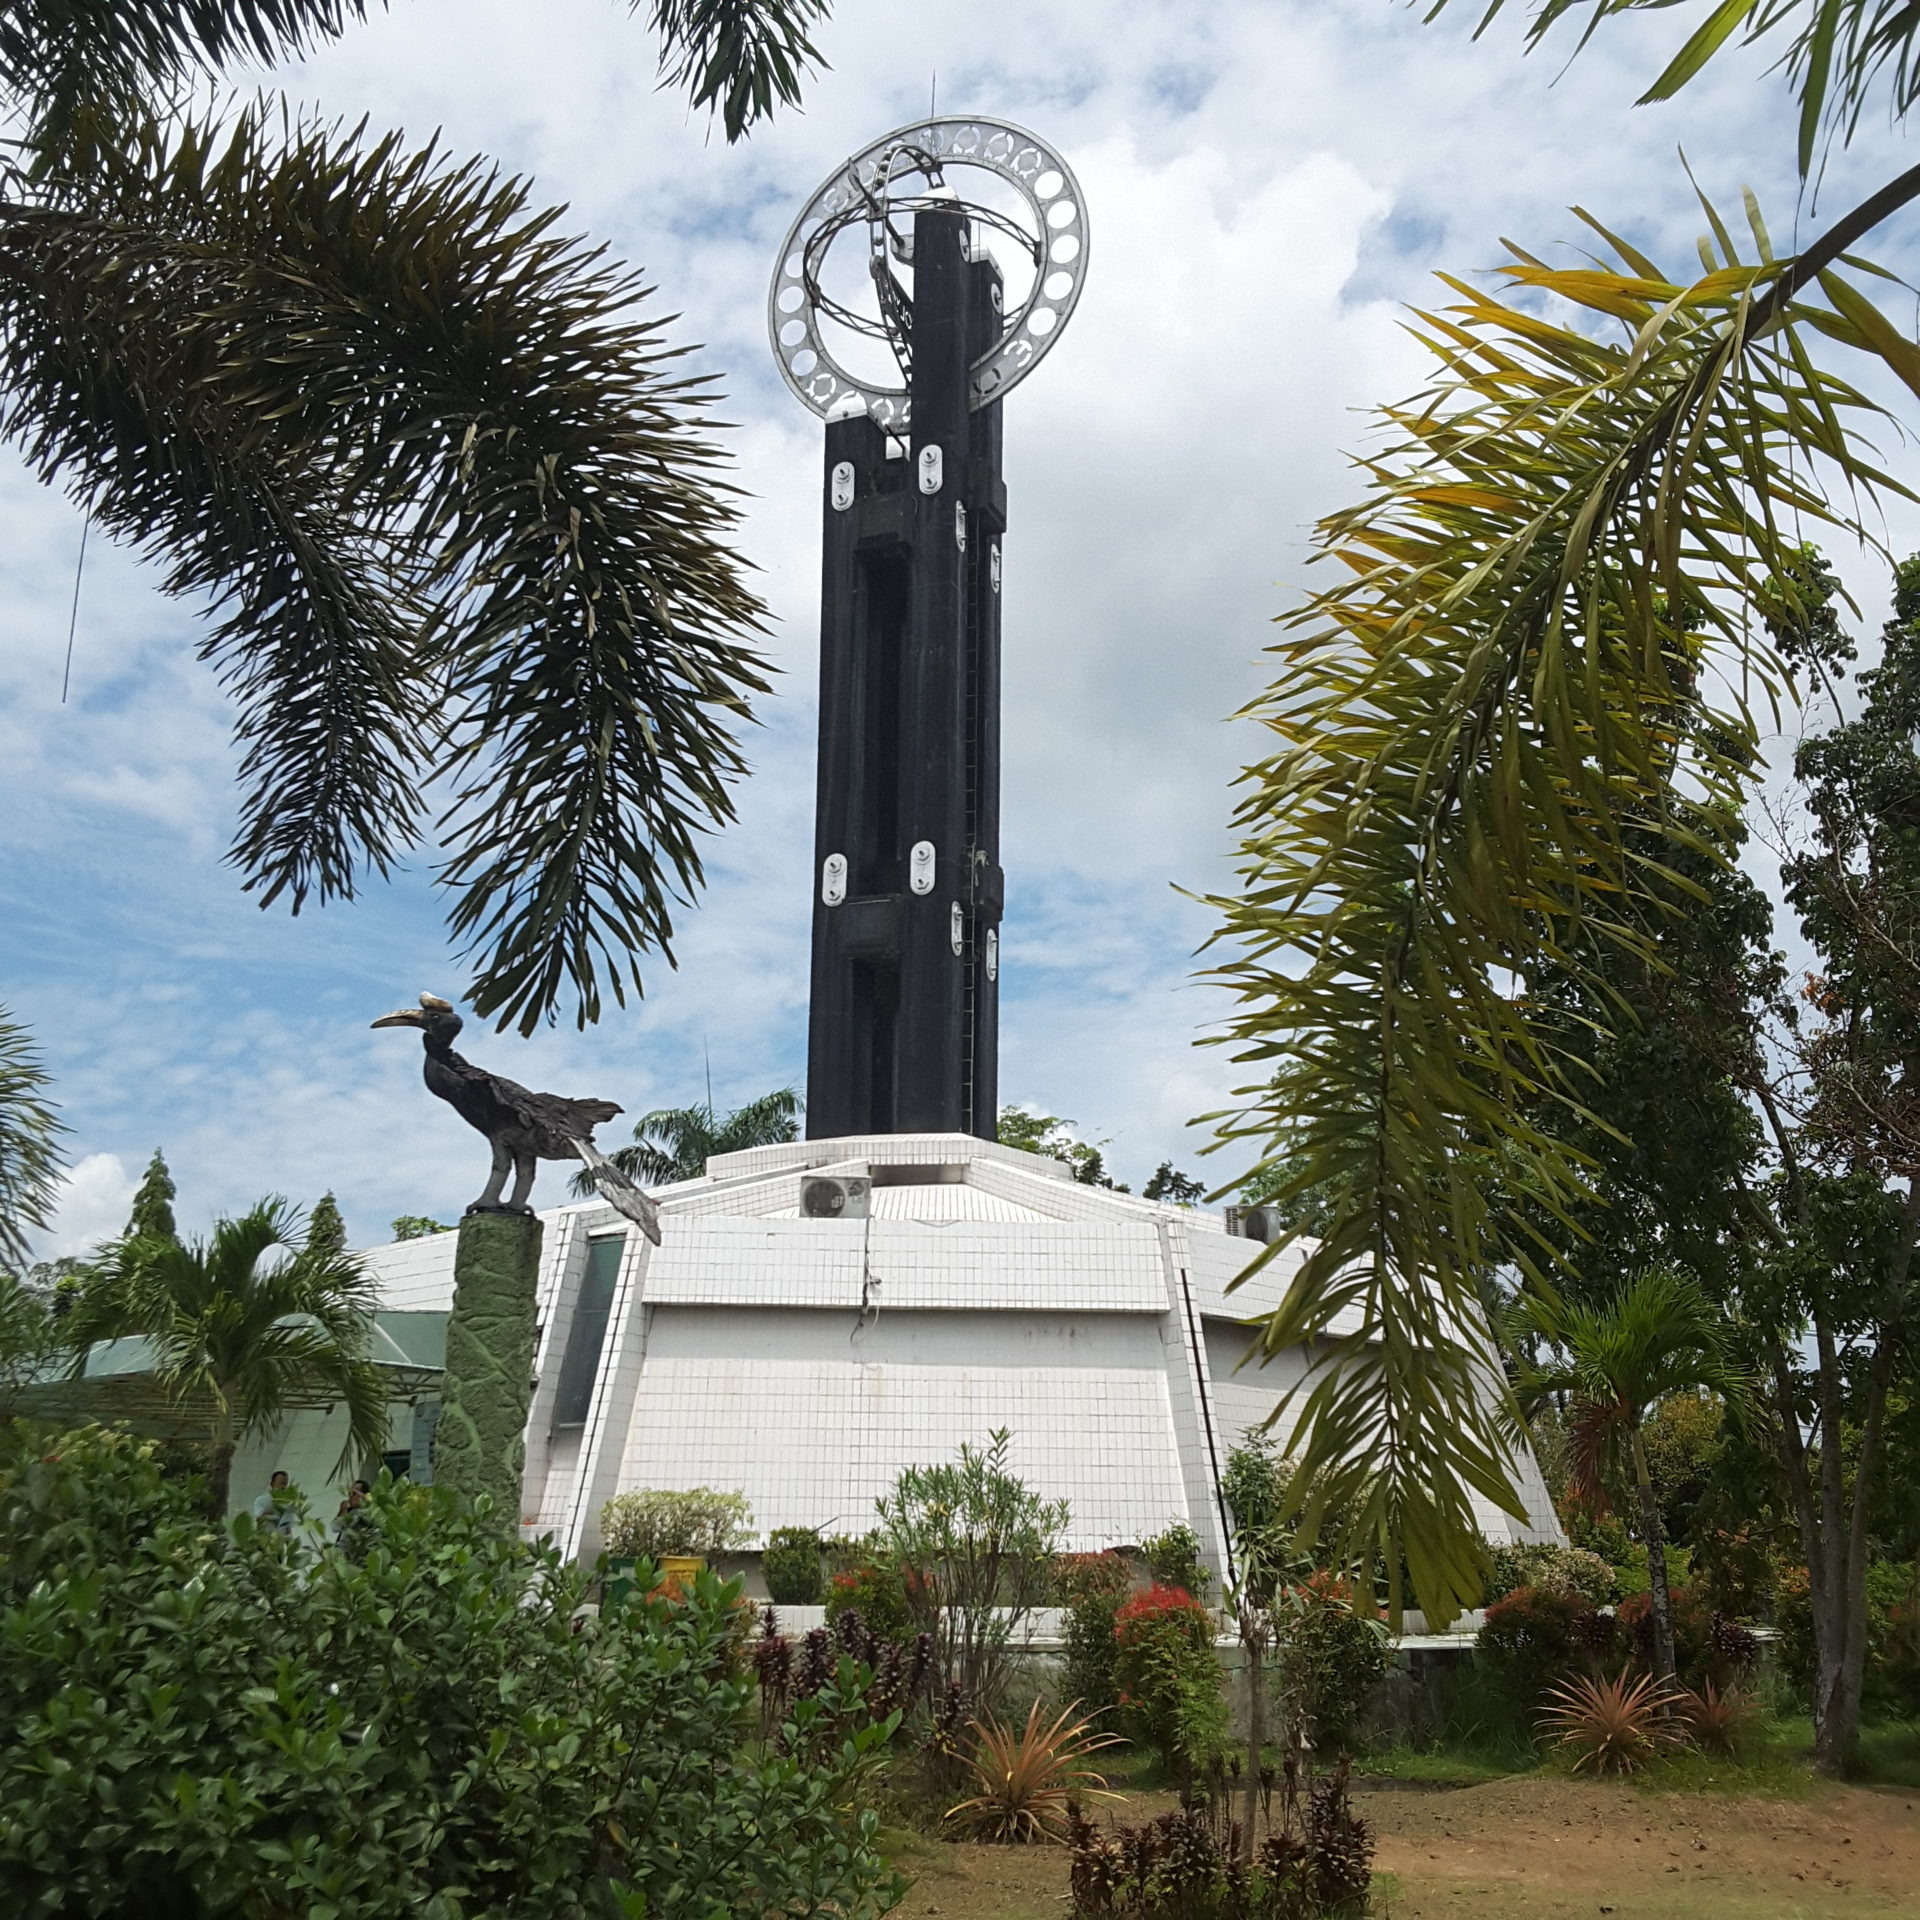 Tugu Khatulistiwa Salah Satu Icon Wisata Kota Pontianak Inilah Inilahkaminews